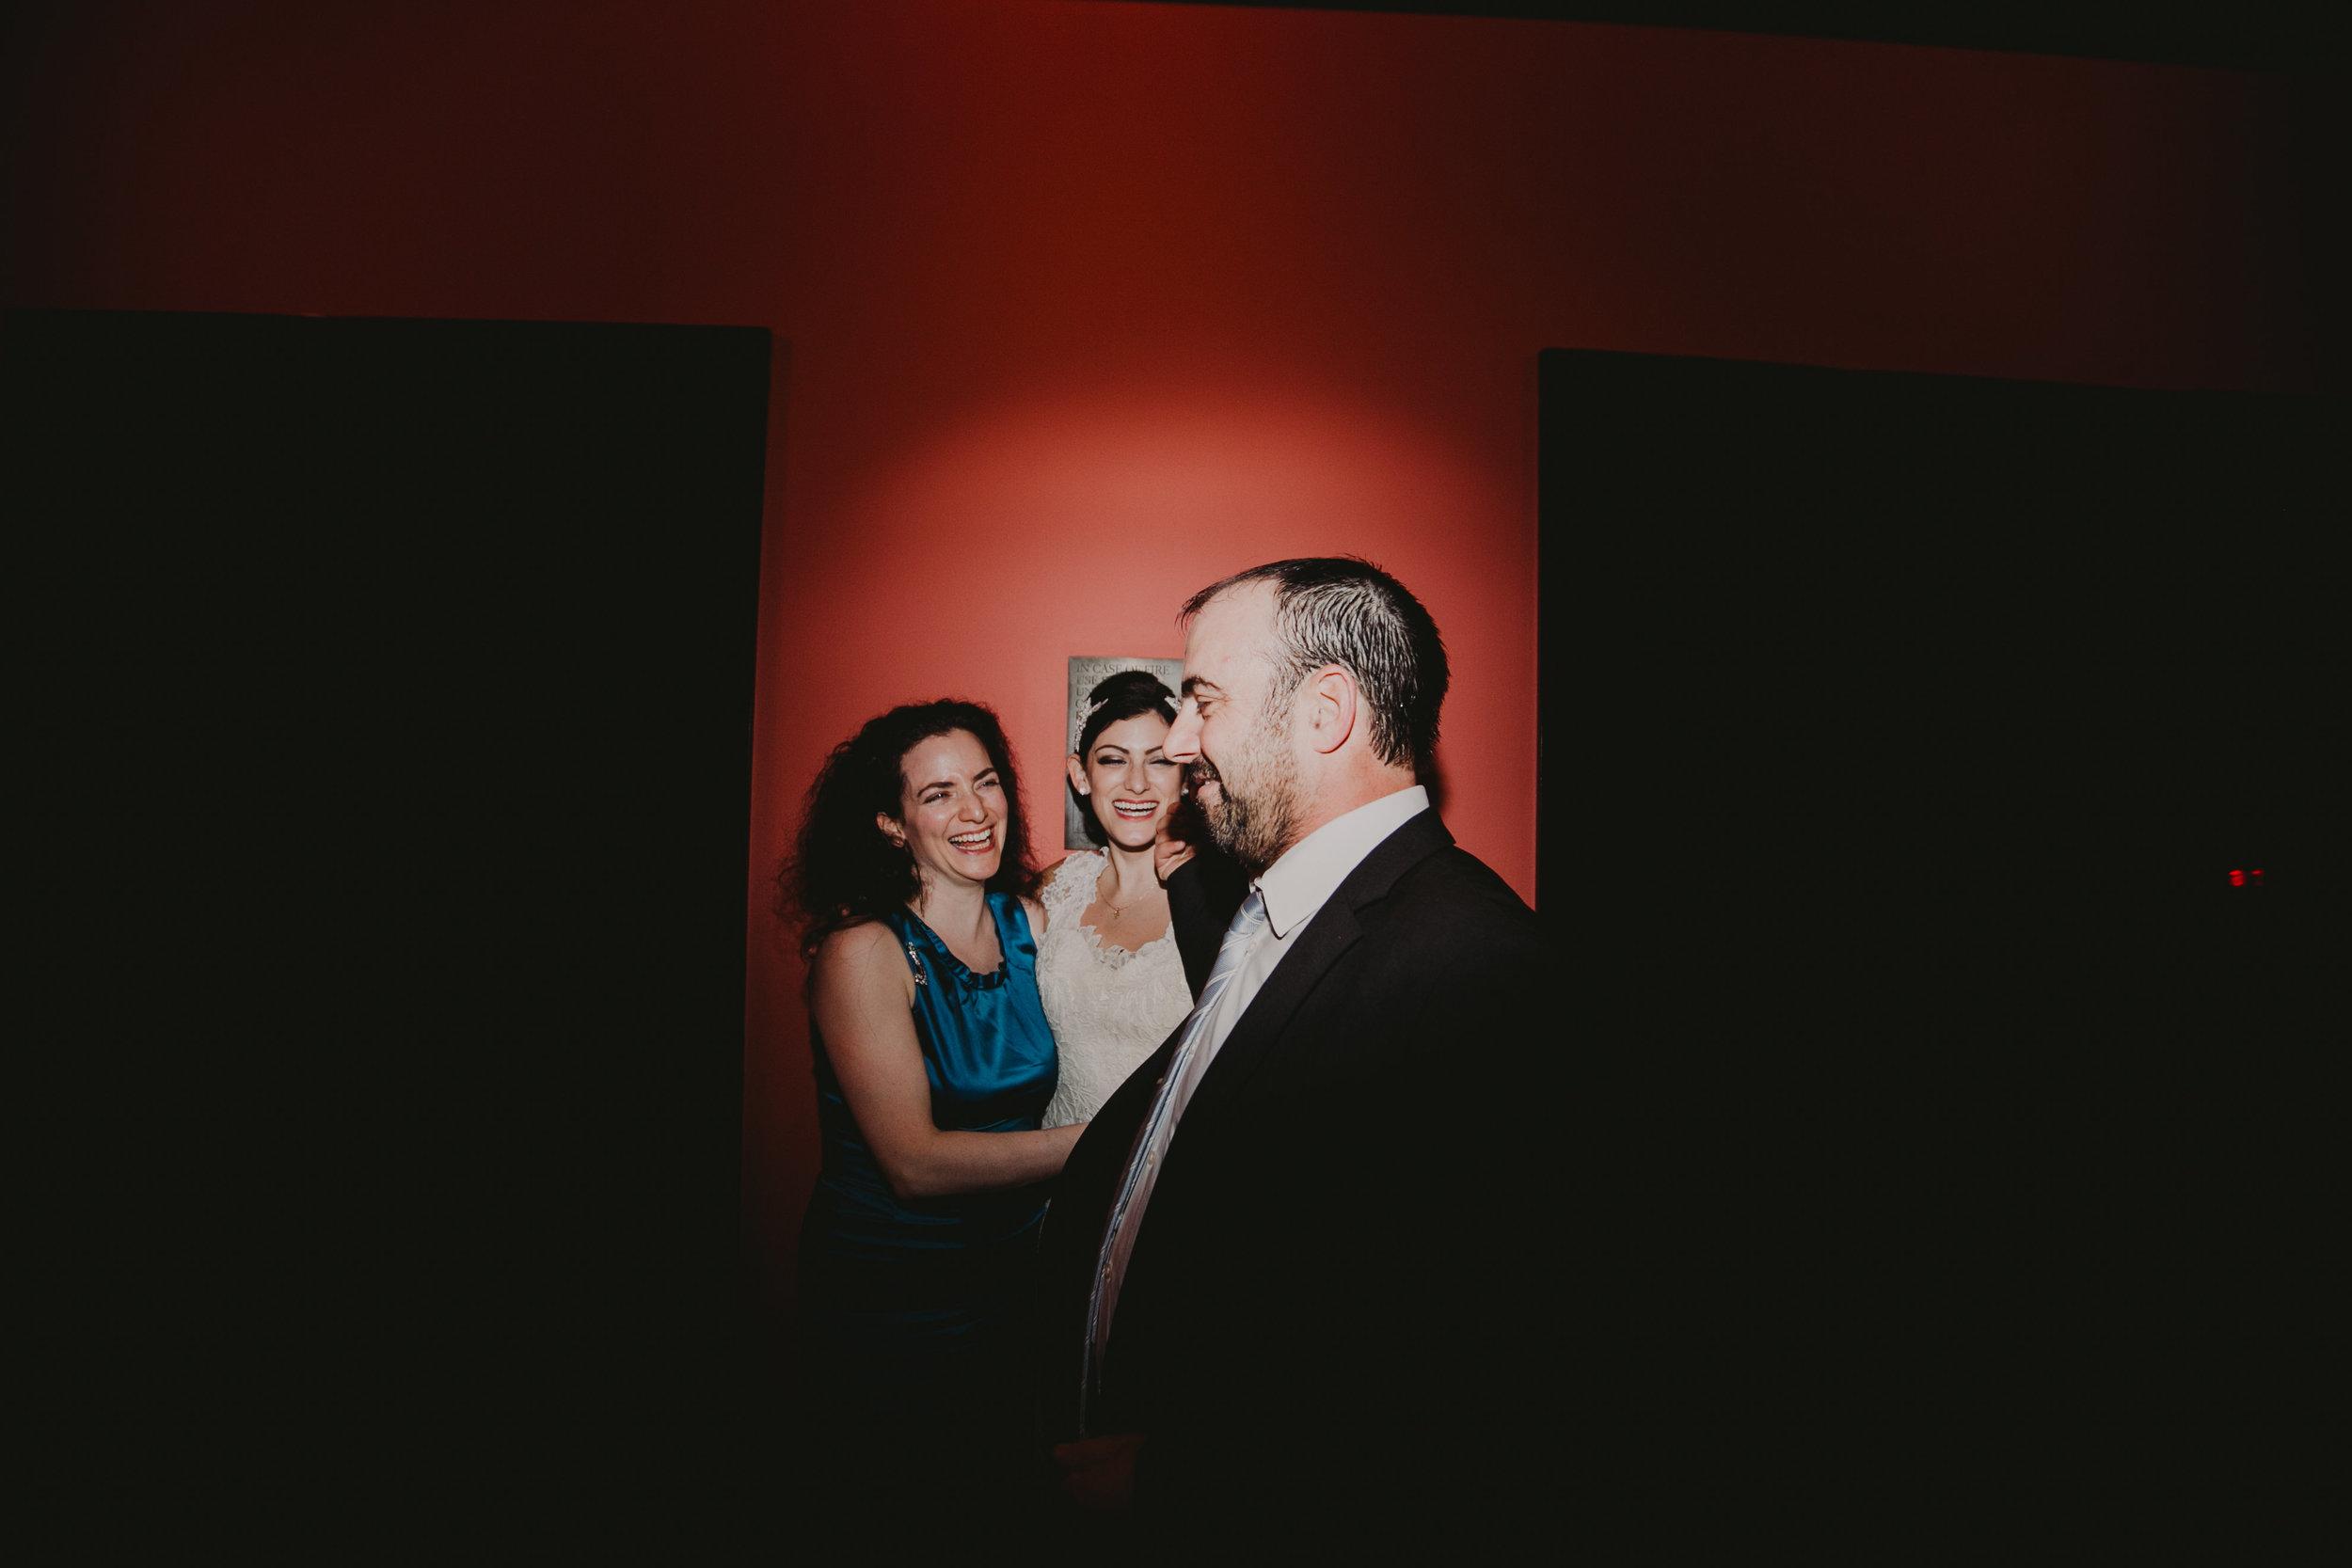 gramercy park hotel jewish wedding vsco fine art warhol canon mark iii chellise michael photography new york city